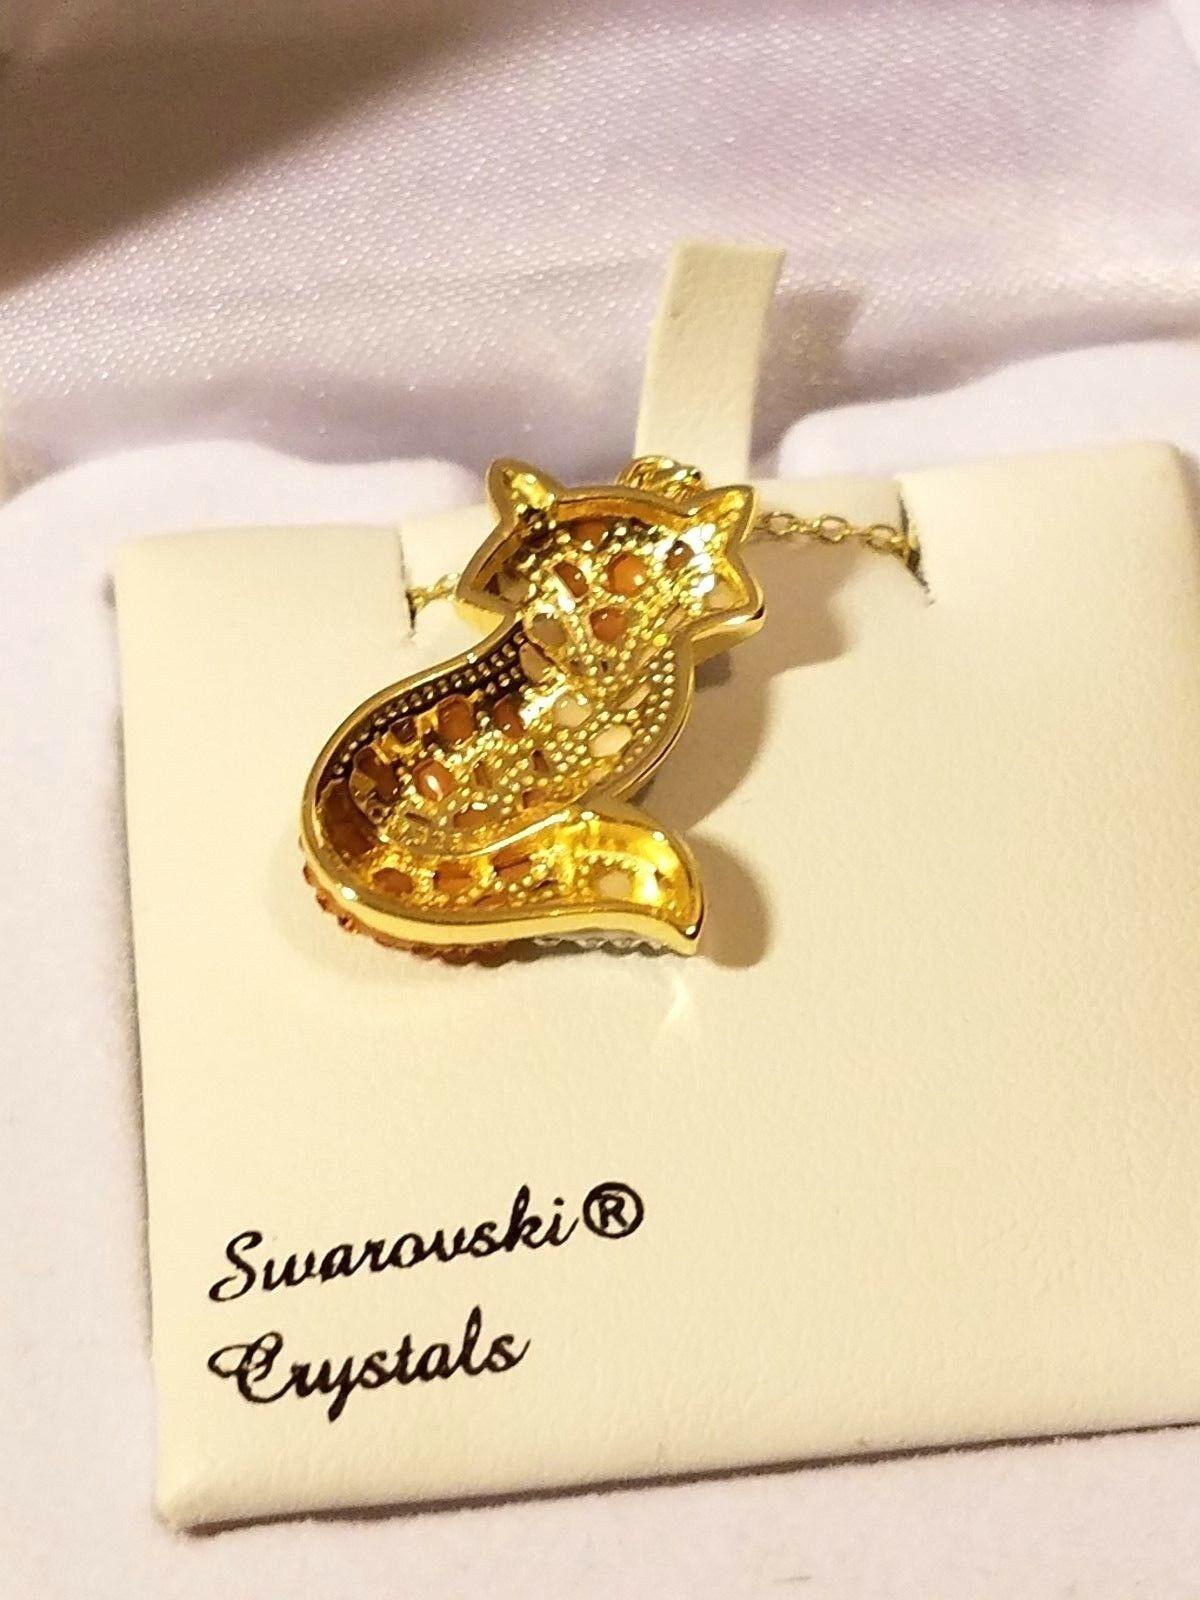 Artistique Swarovski Crystal & 14k Gold - Orange Fox Pendant Necklace NIB image 3